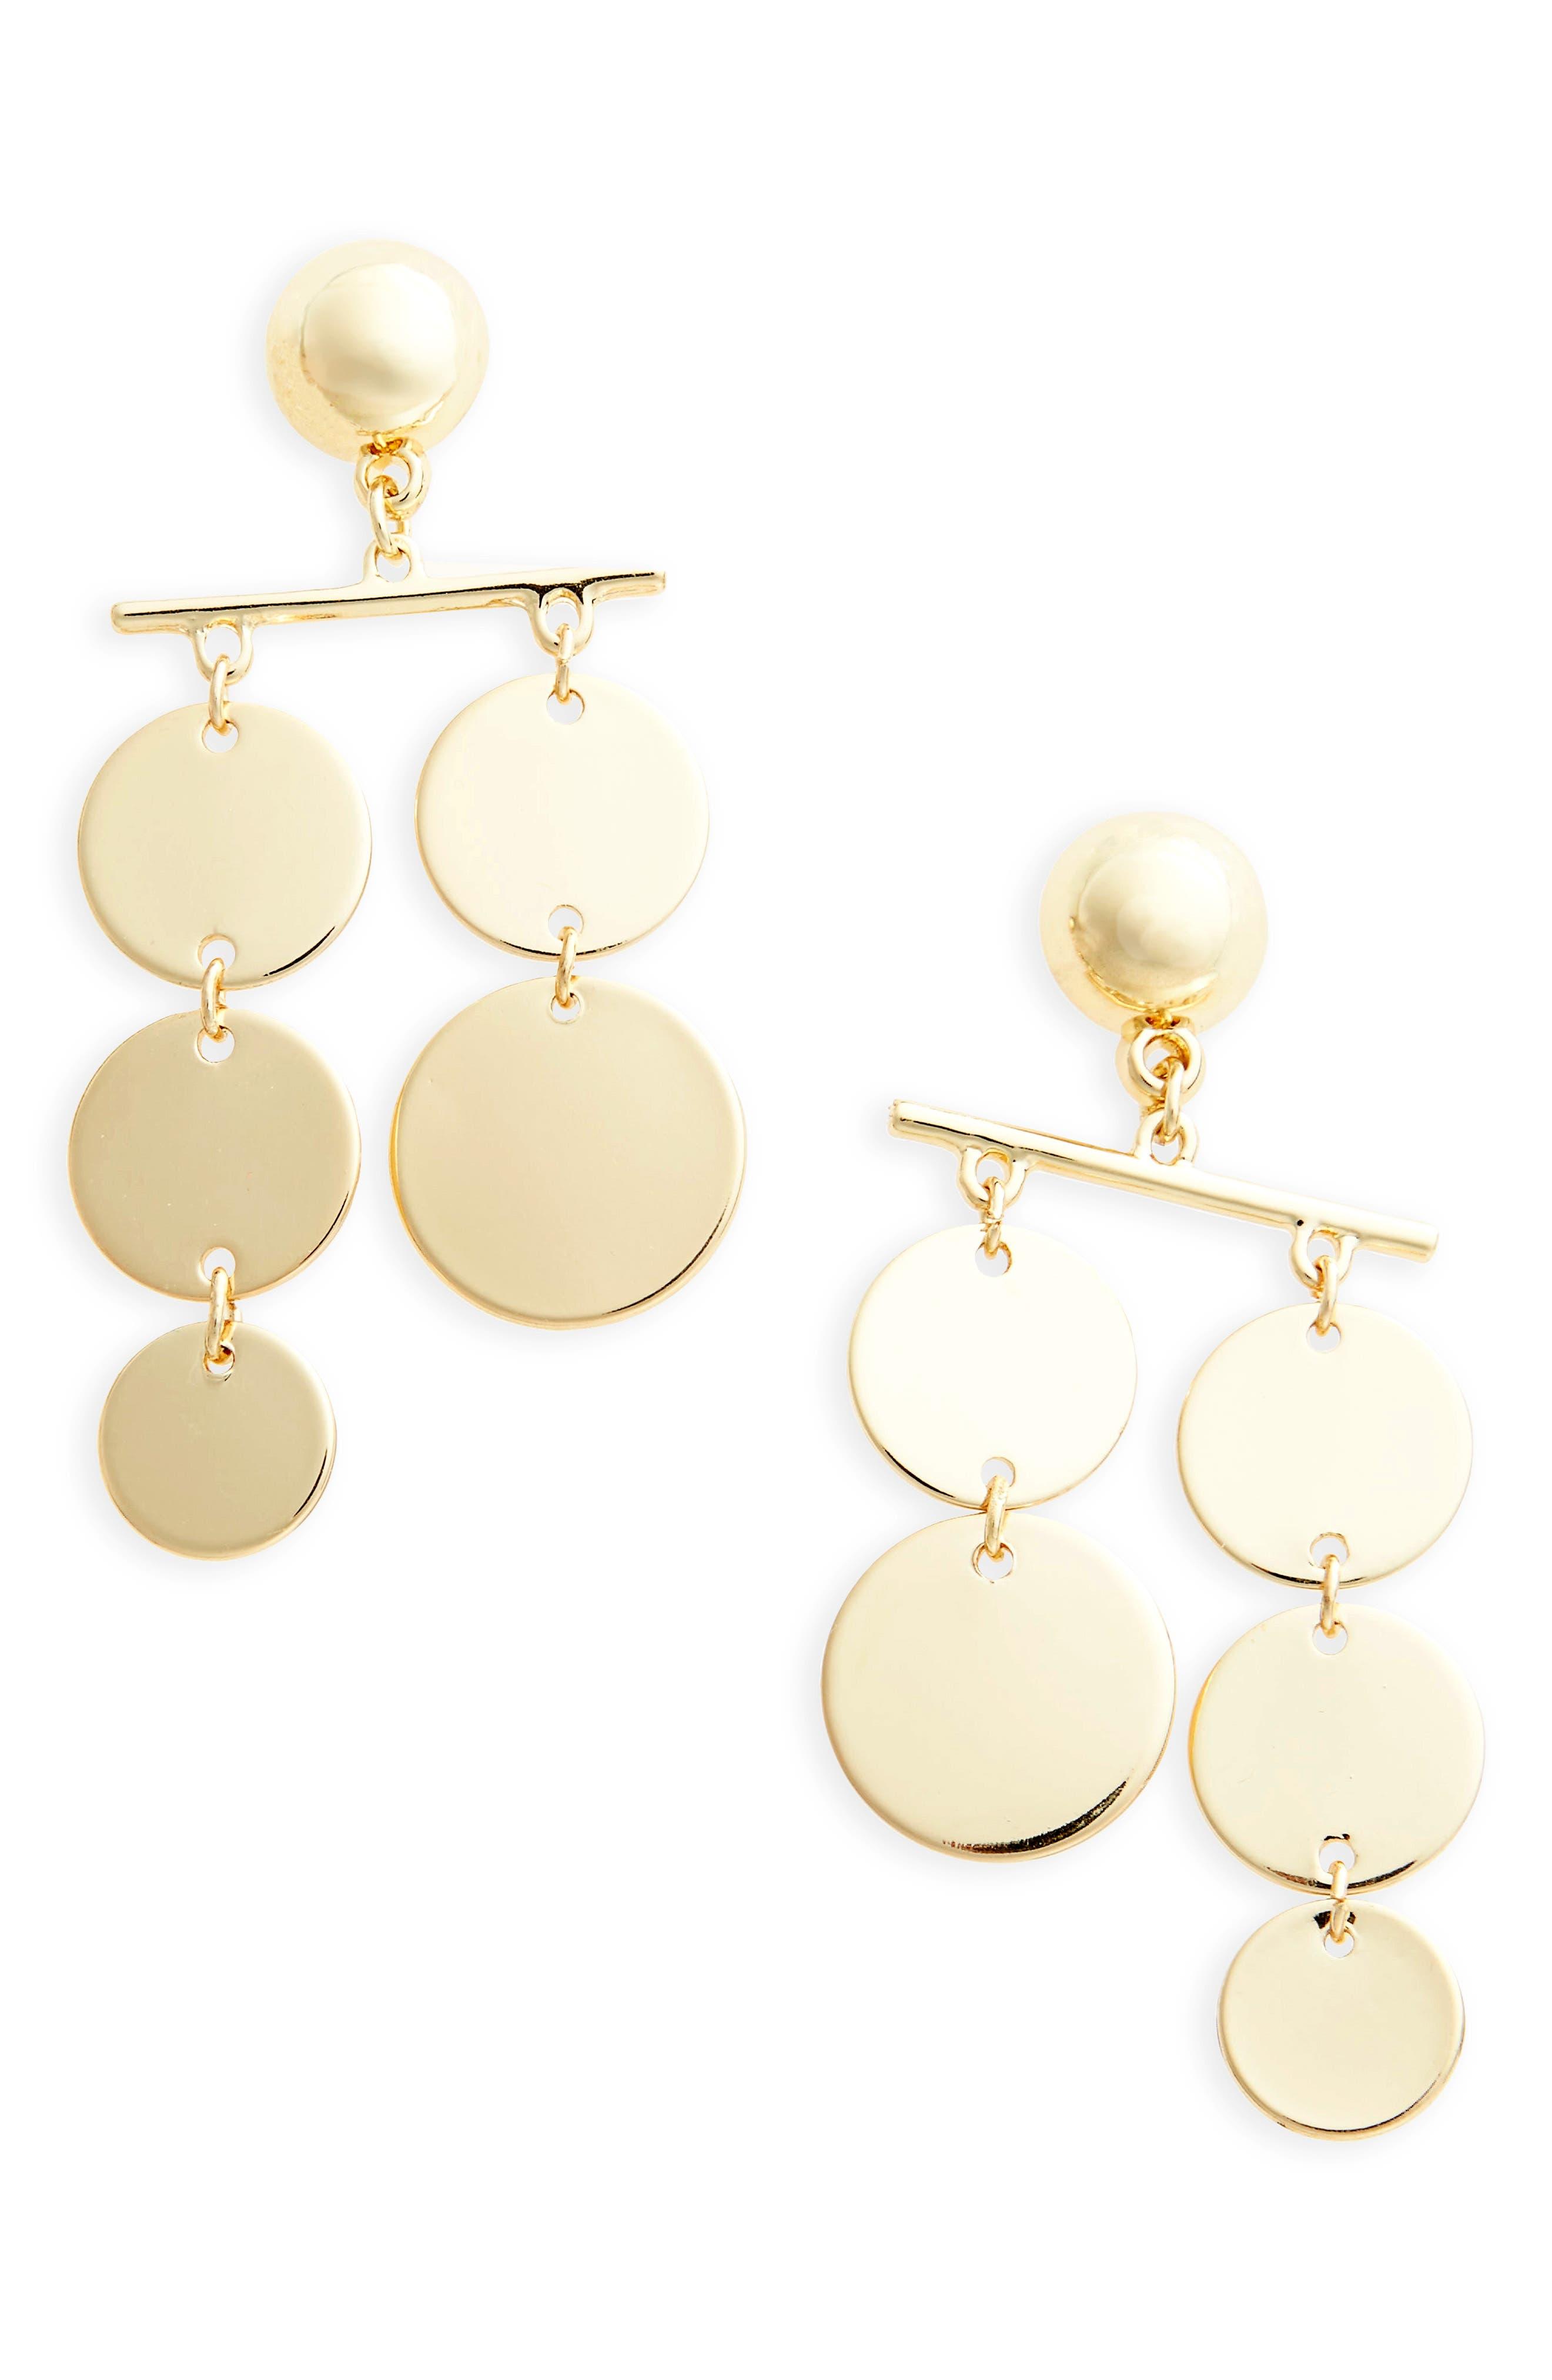 Main Image - Topshop Circle Mobile Earrings